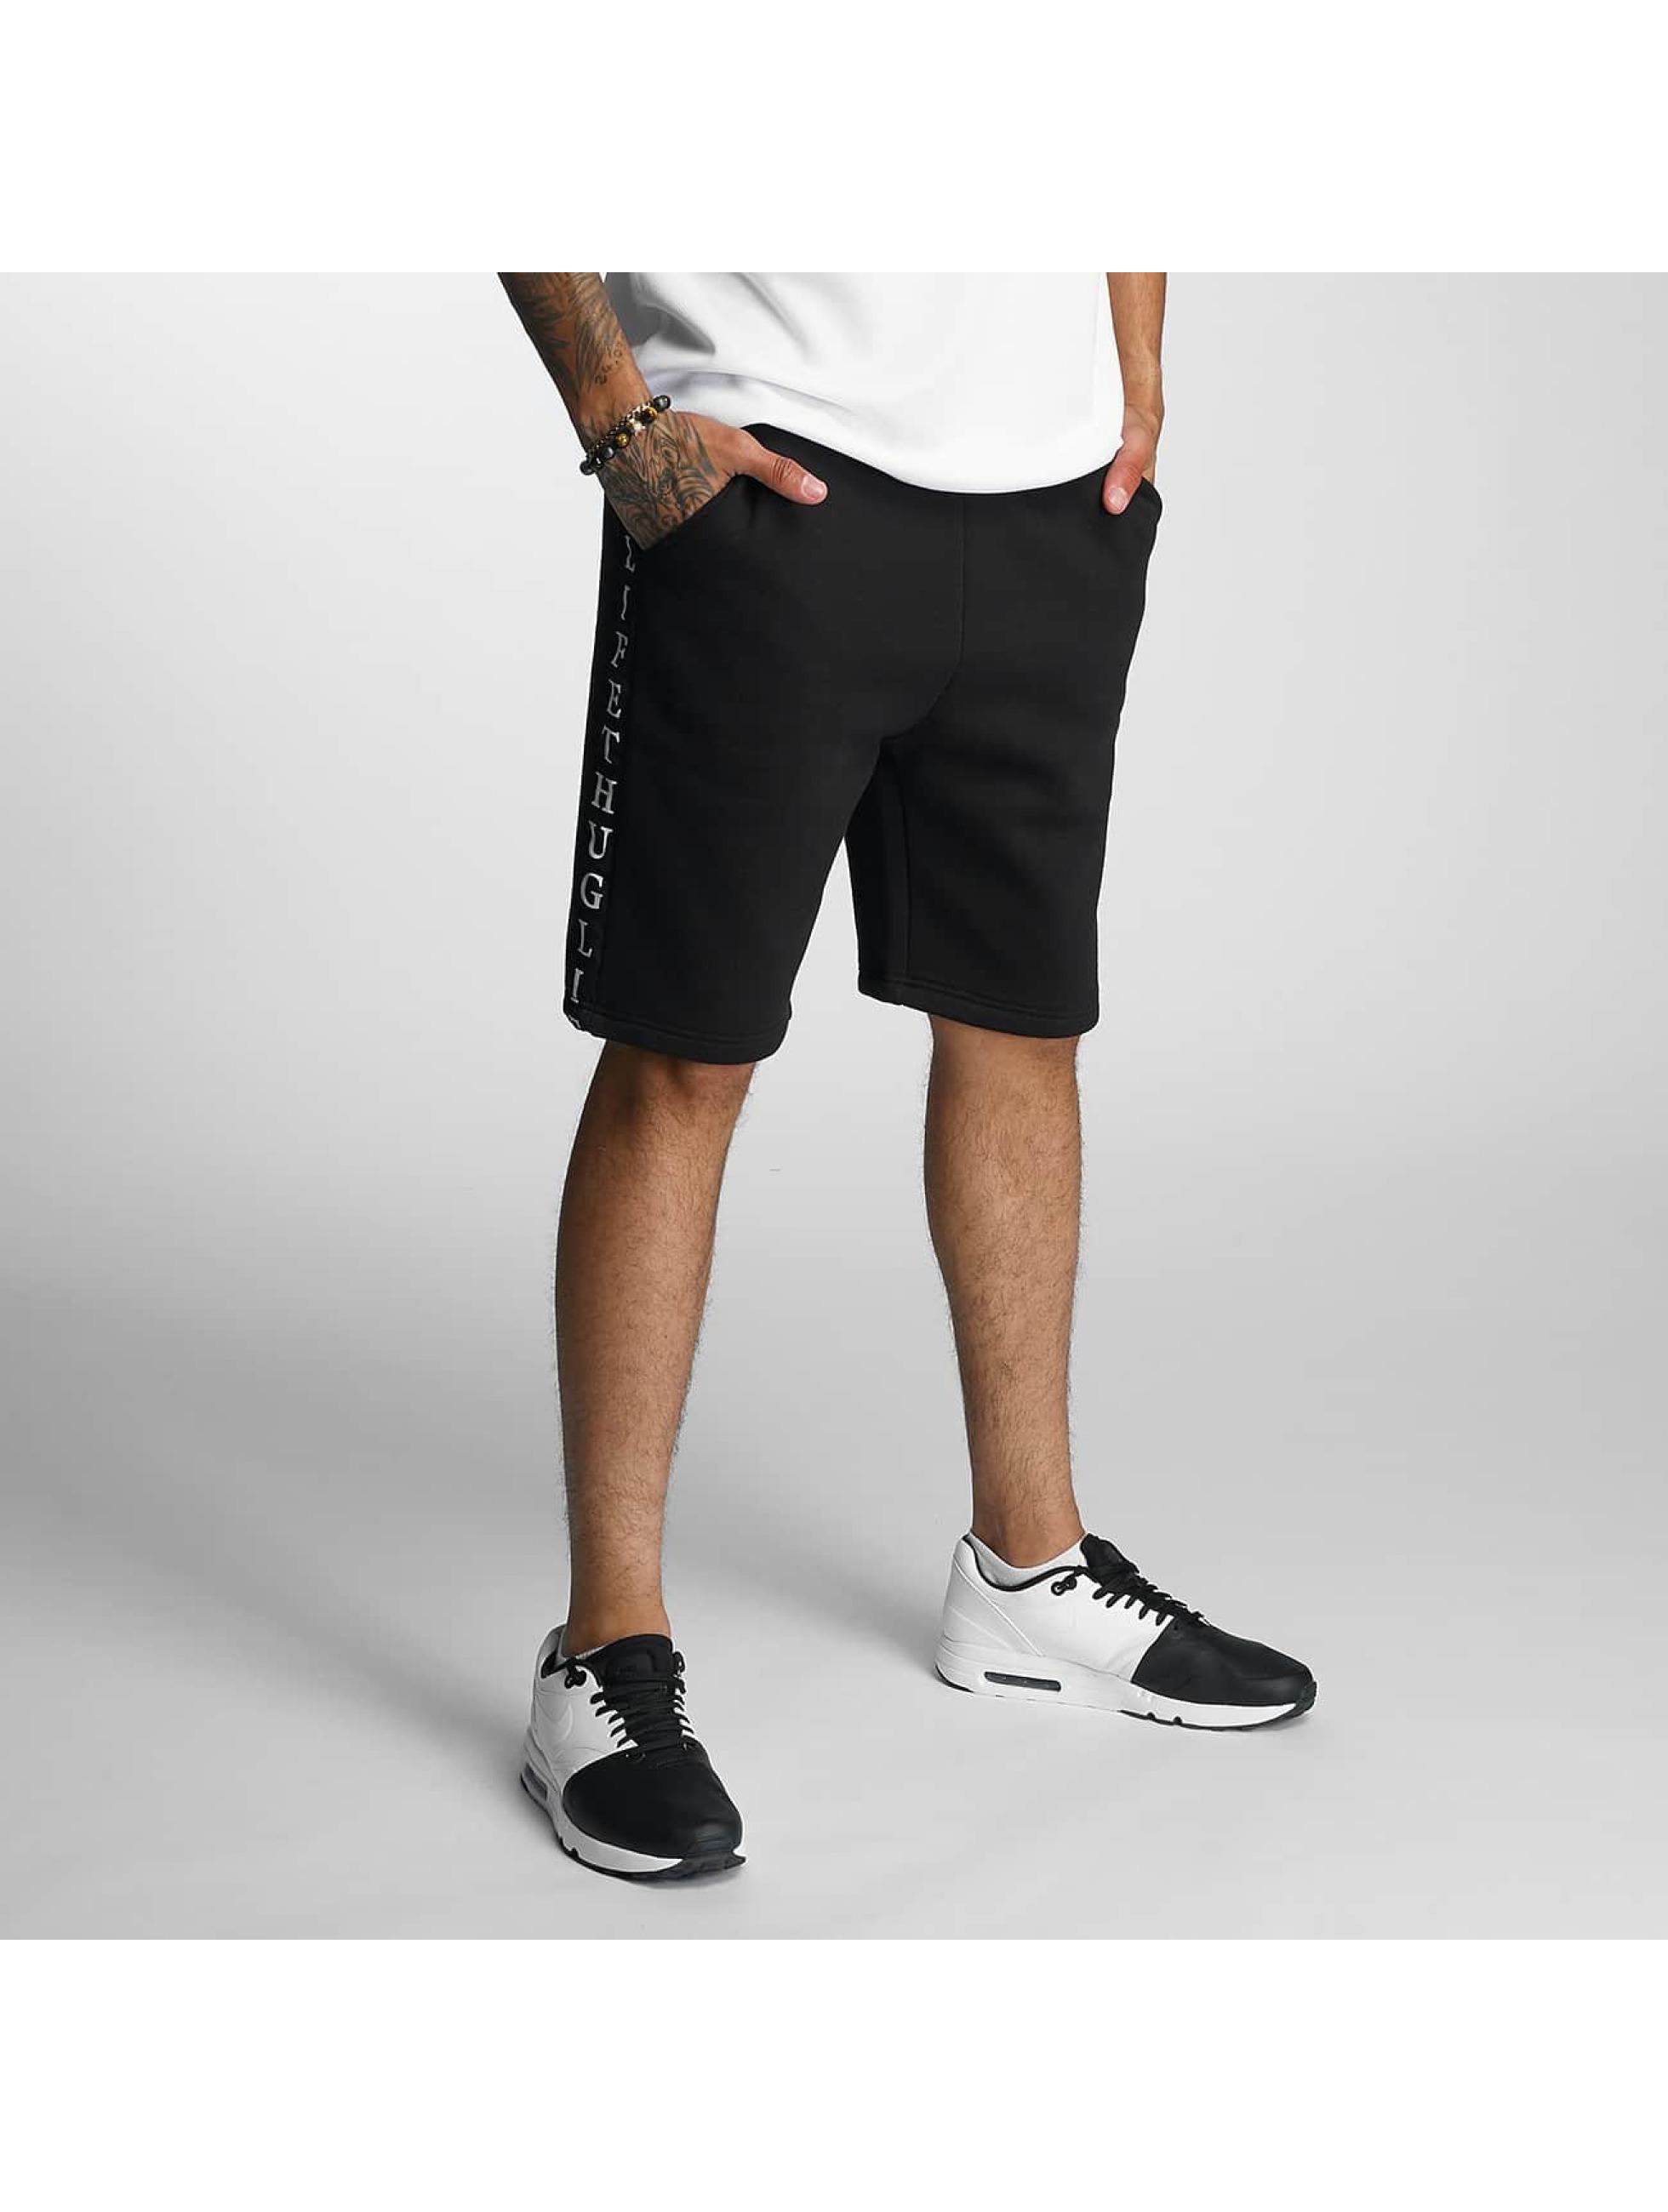 Thug Life / Short Twostripes in black S